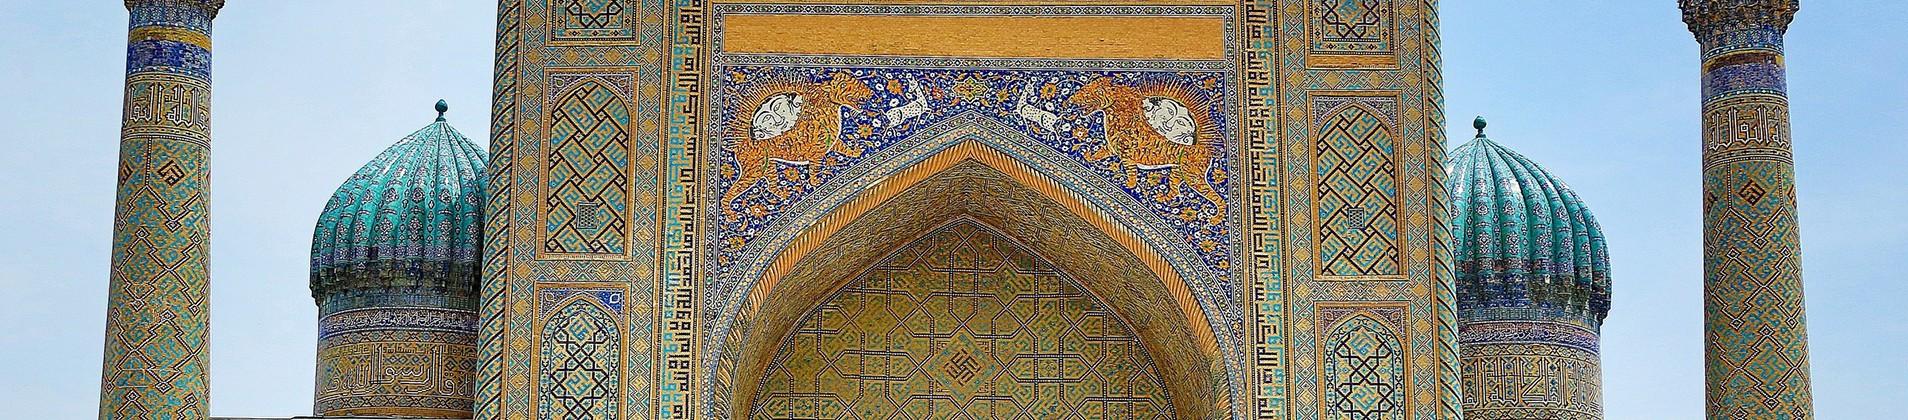 Sherdor Madrasah - 1